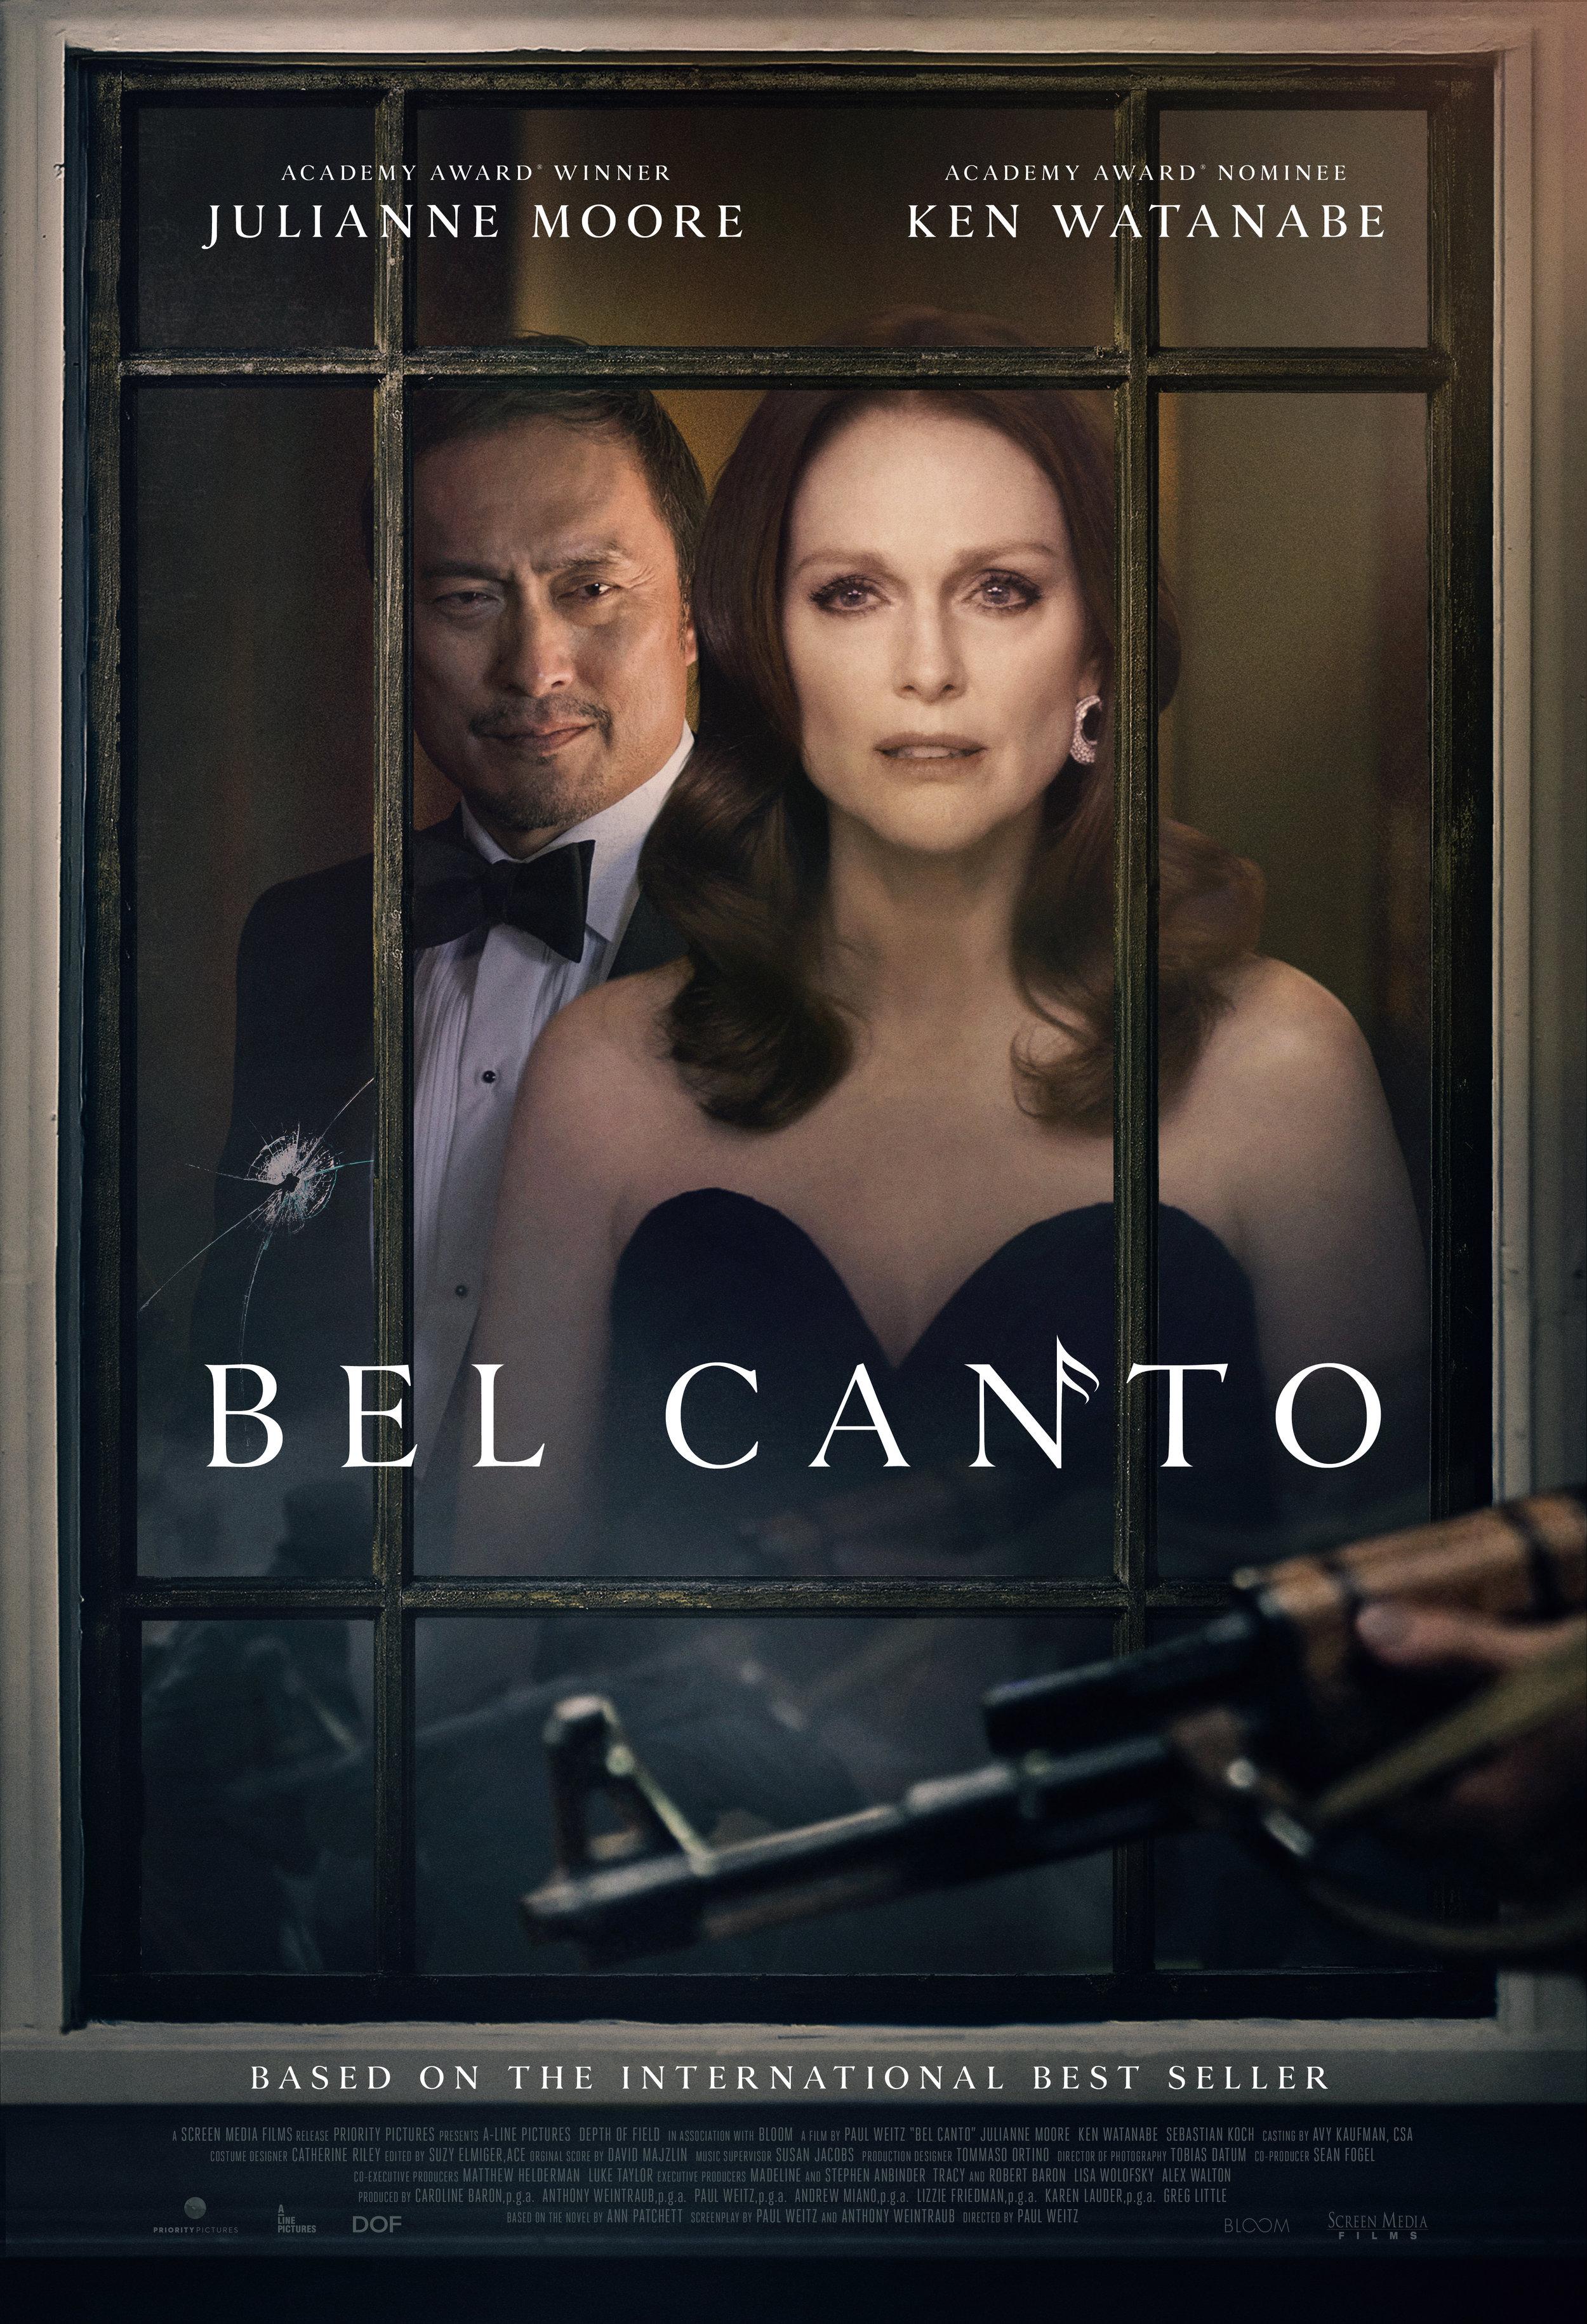 Screenplay by Paul Weitz and Anthony Weintraub Produced by Caroline Baron and Anthony Weintraub (2018)